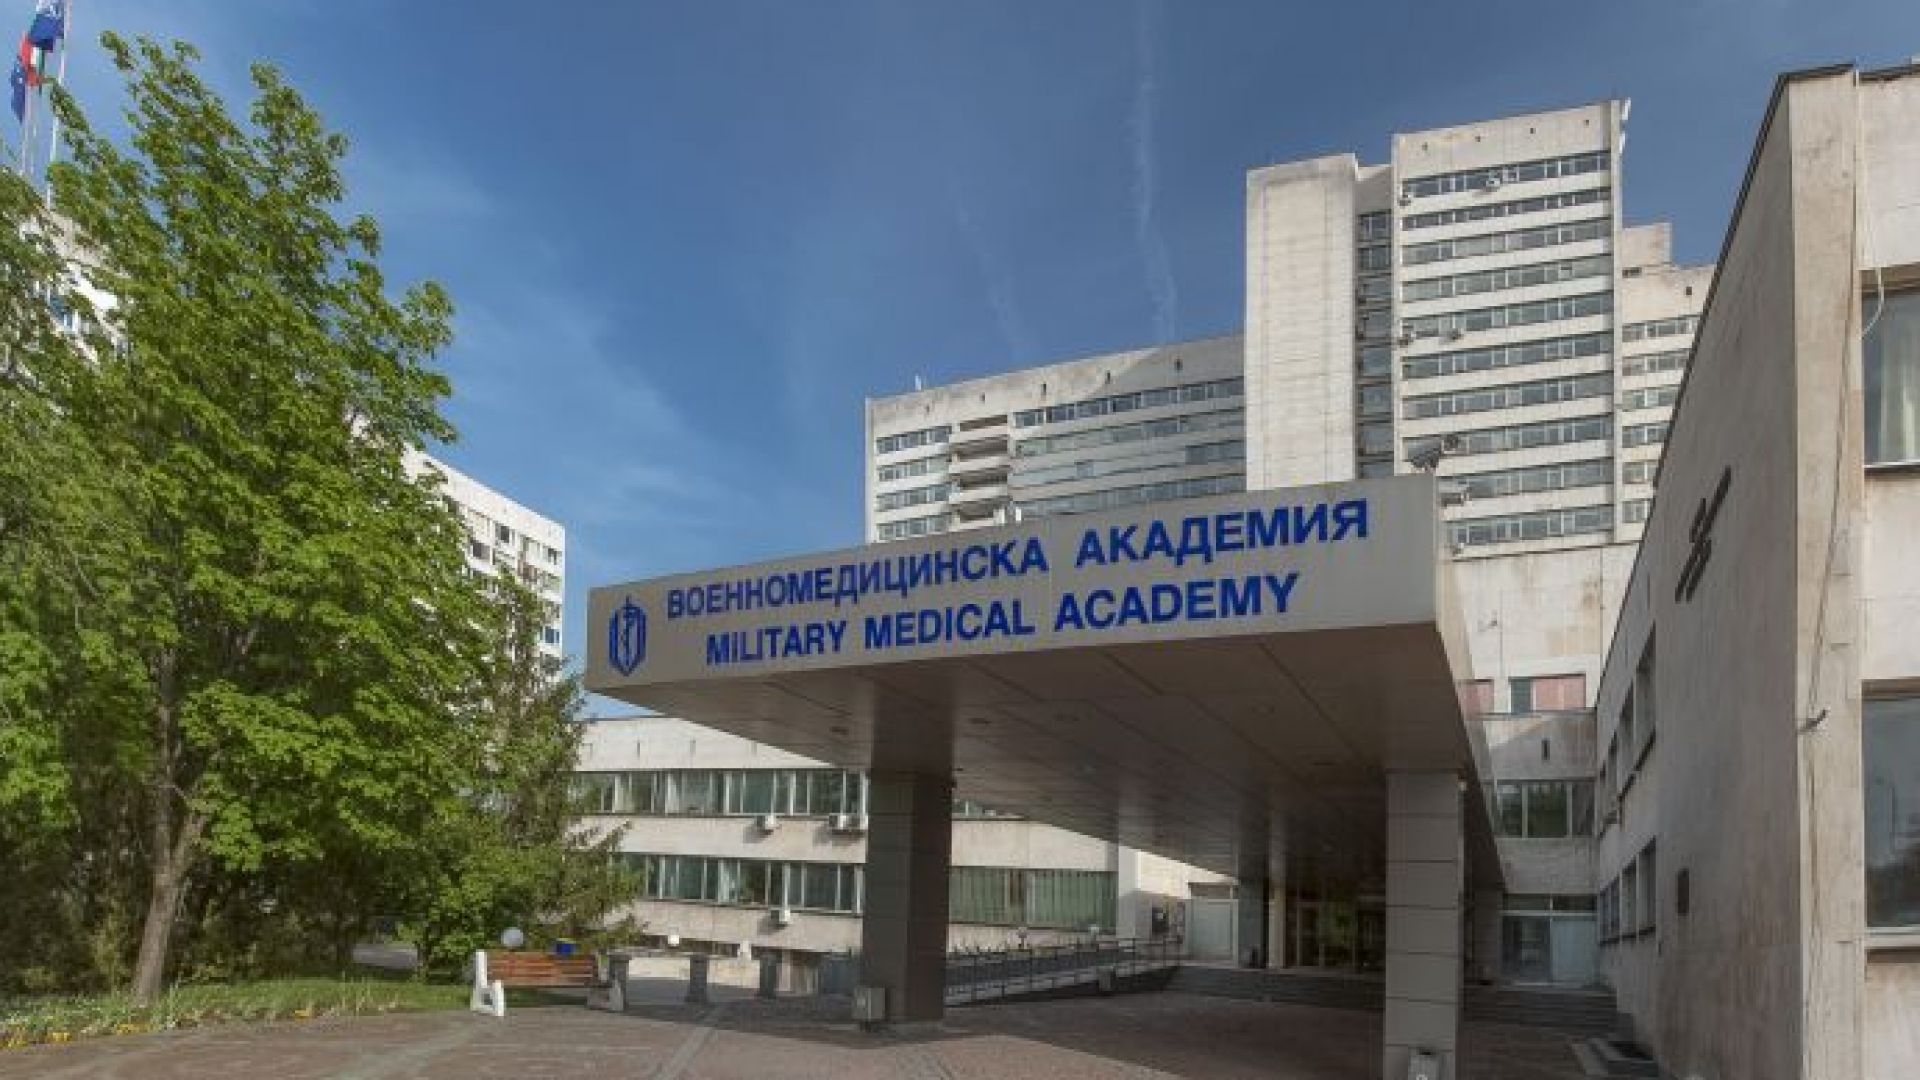 ВМА обяви конкурс за 25 военни лекари